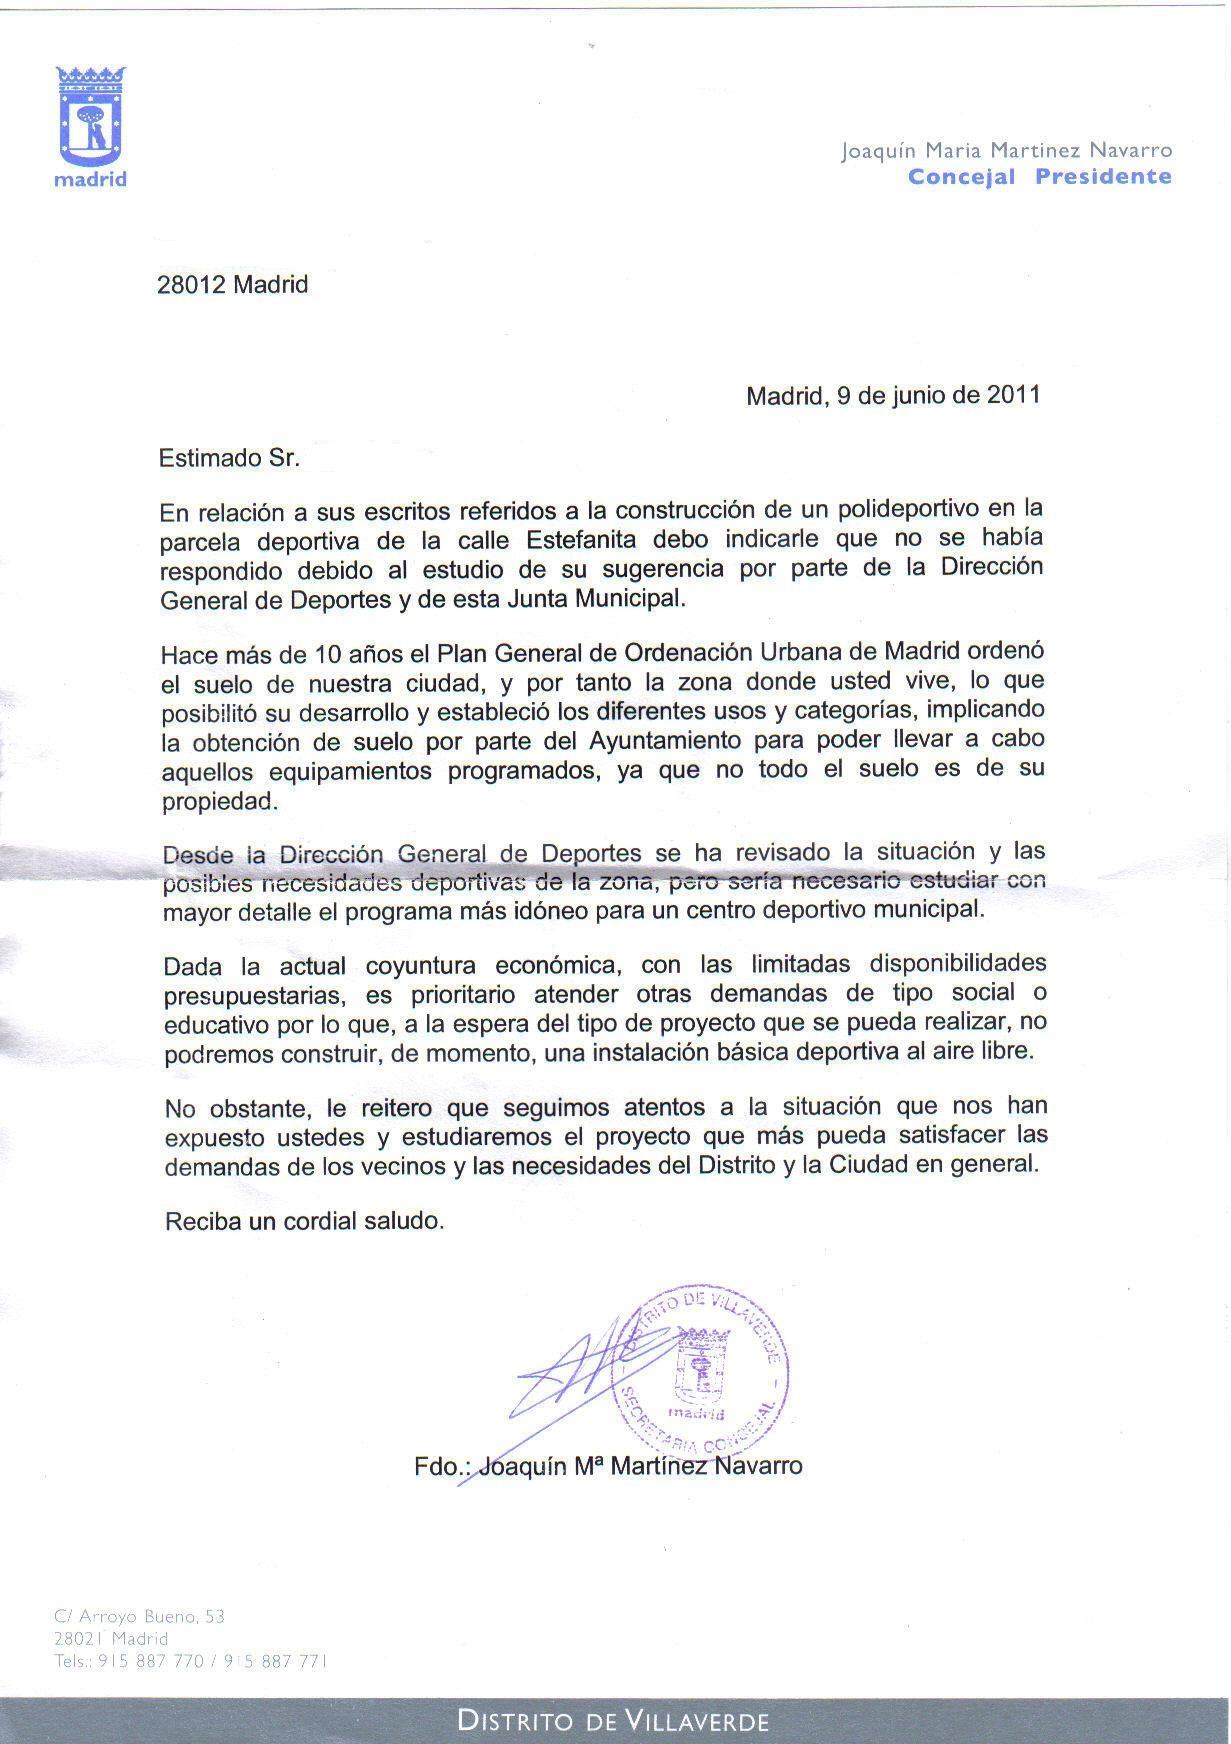 carta de solicitud de materialesal municipio